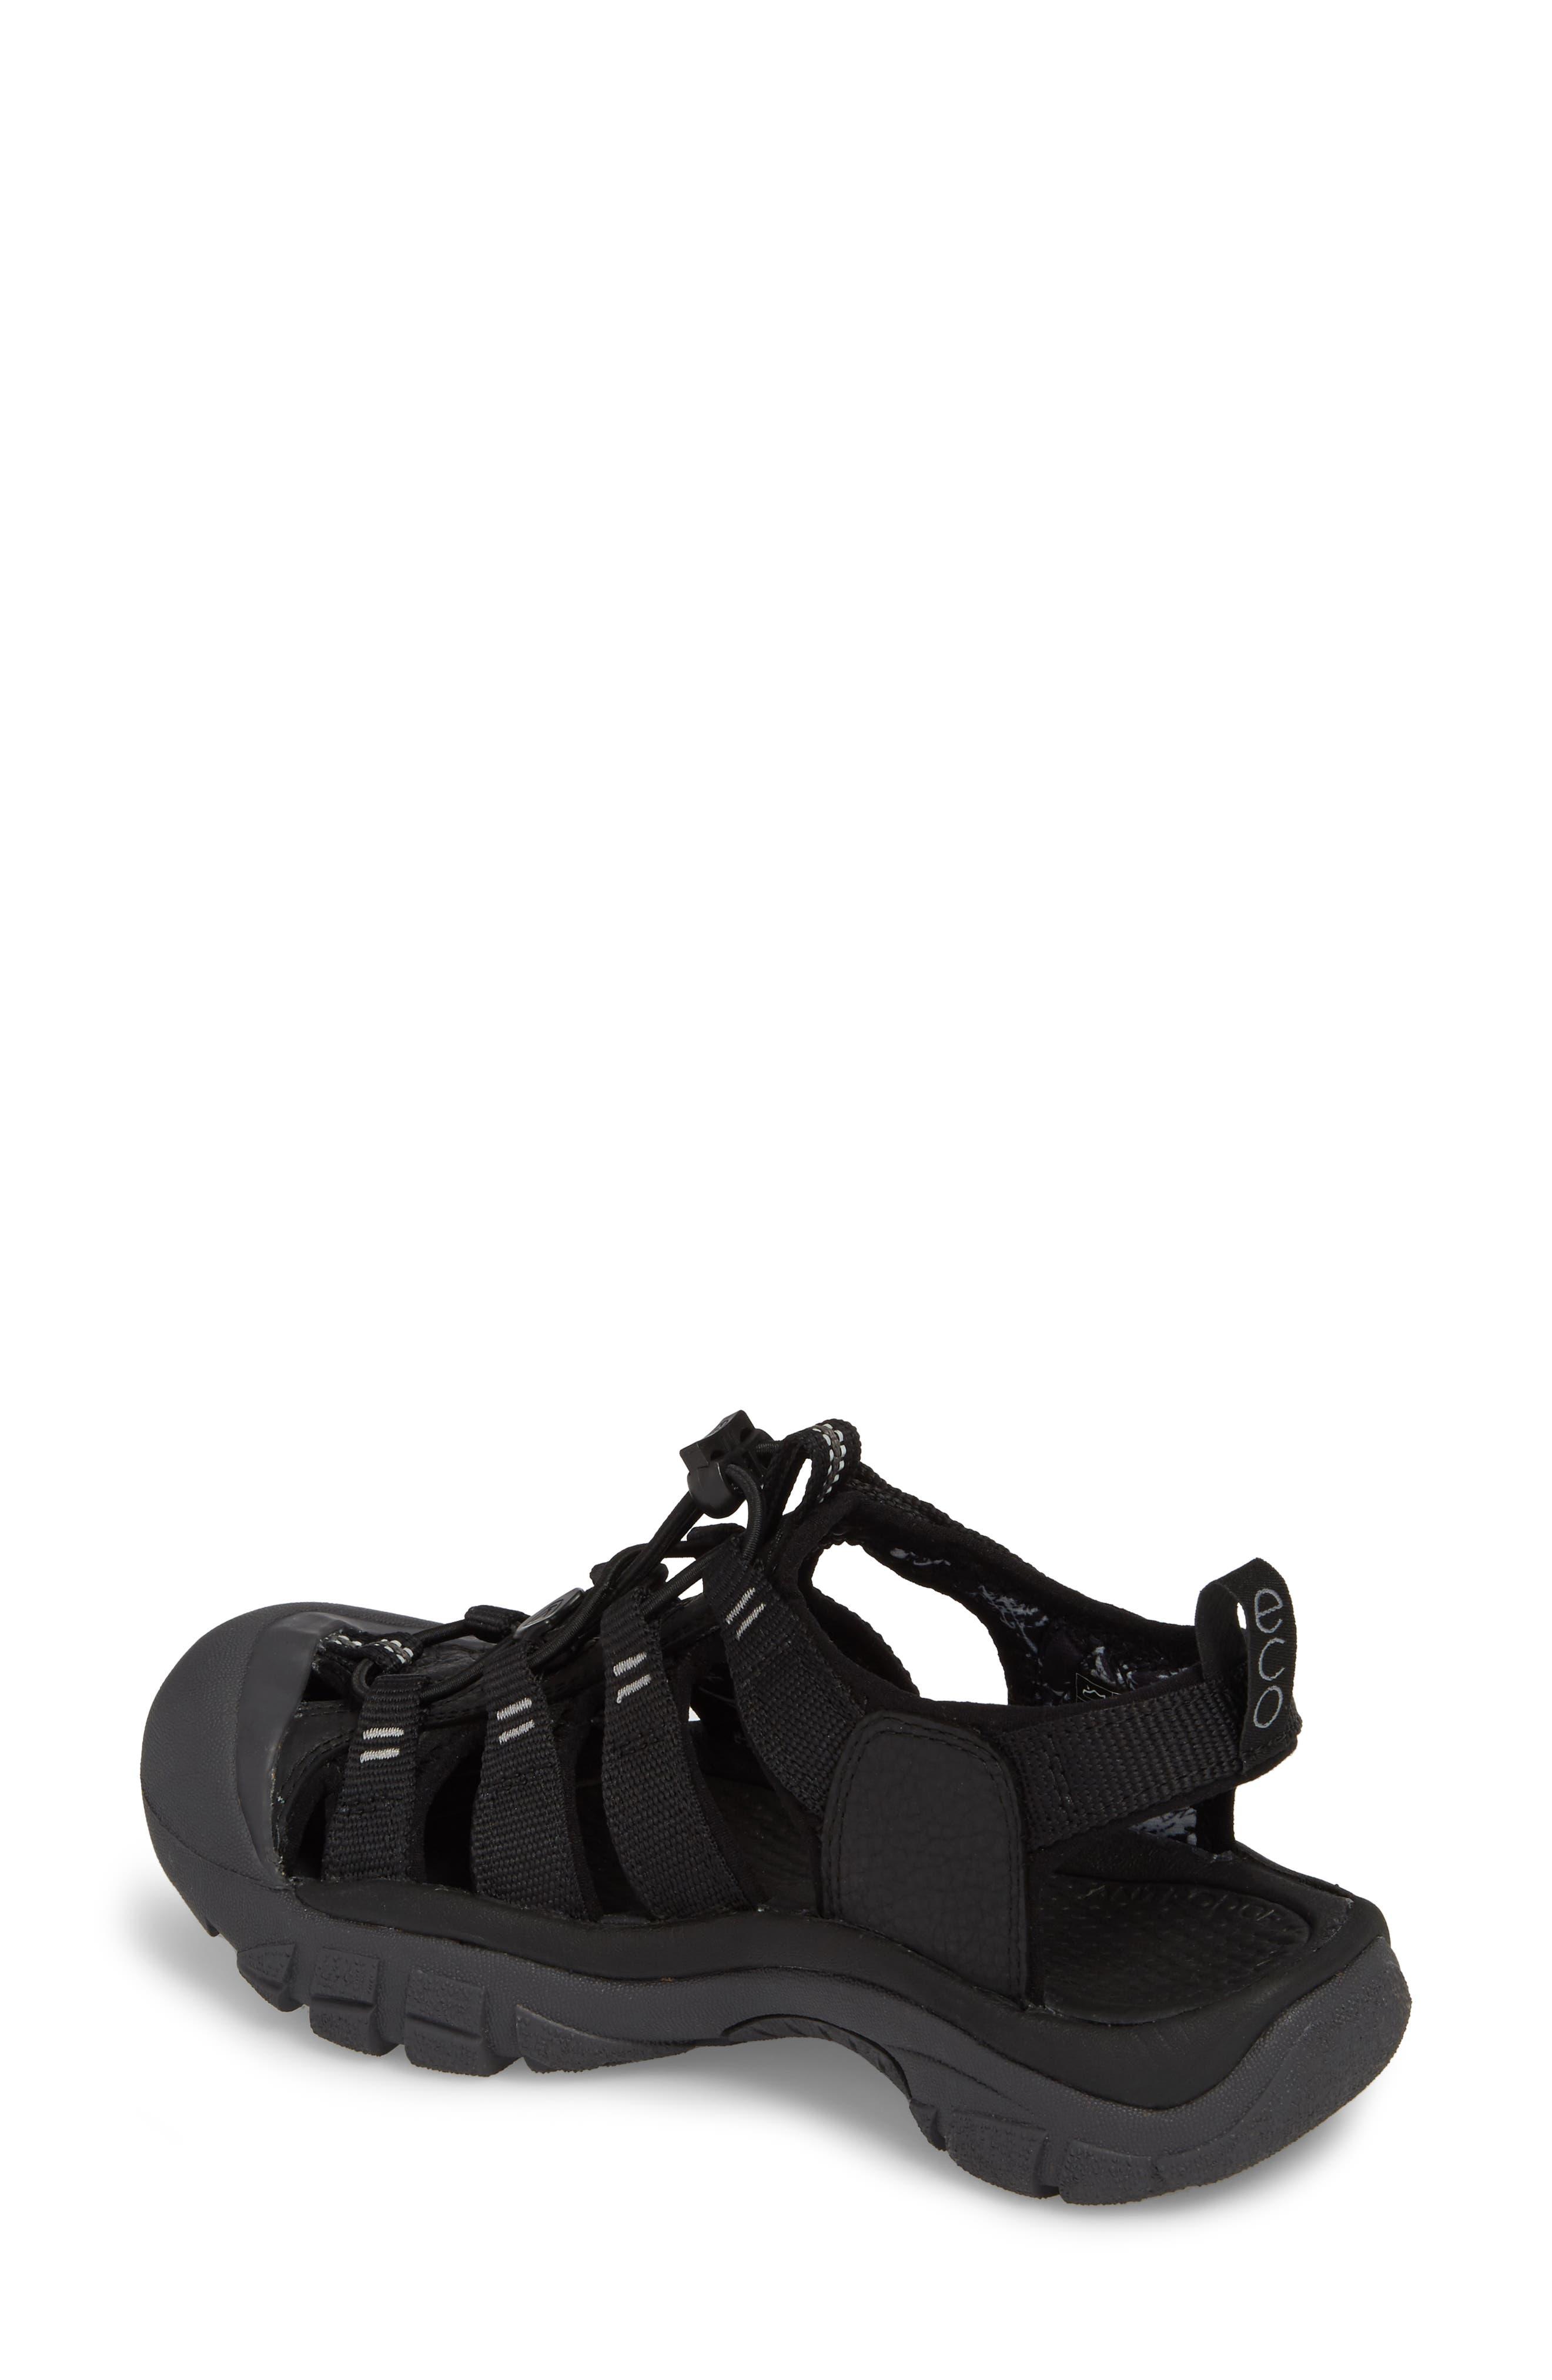 KEEN,                             Newport Eco Waterproof Sandal,                             Alternate thumbnail 2, color,                             007